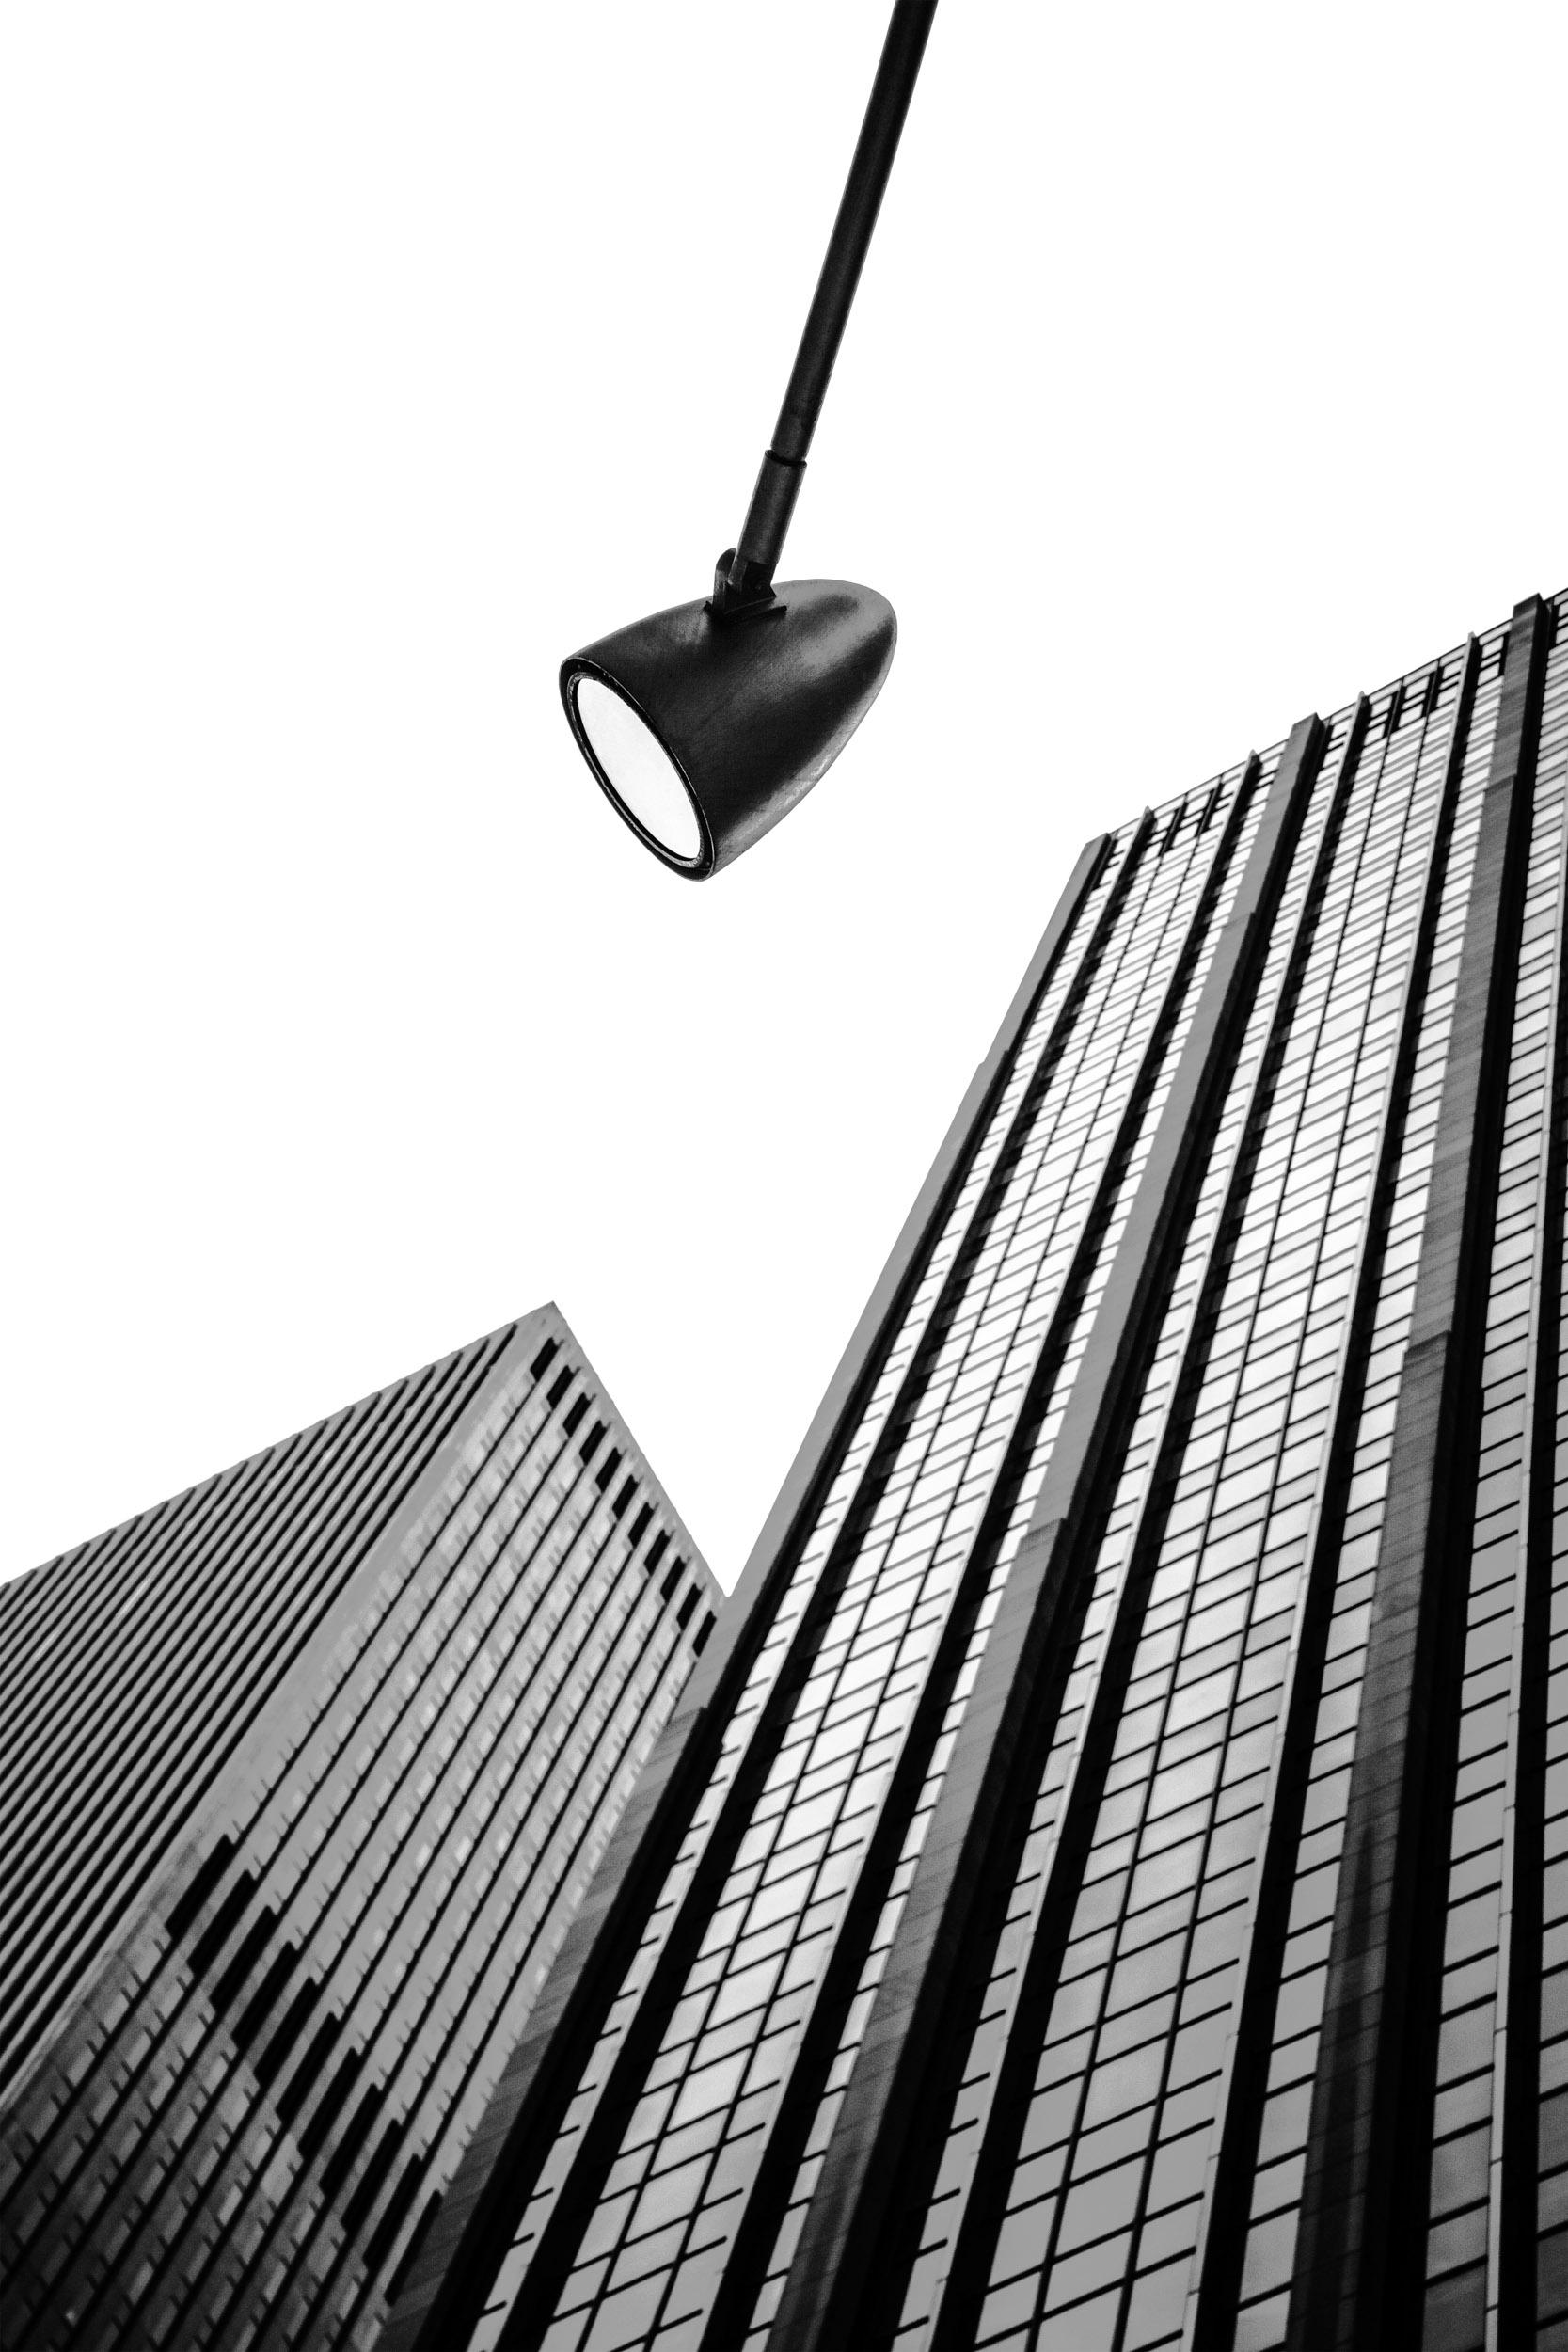 Streetlights of New York #54 New York, NY 2010